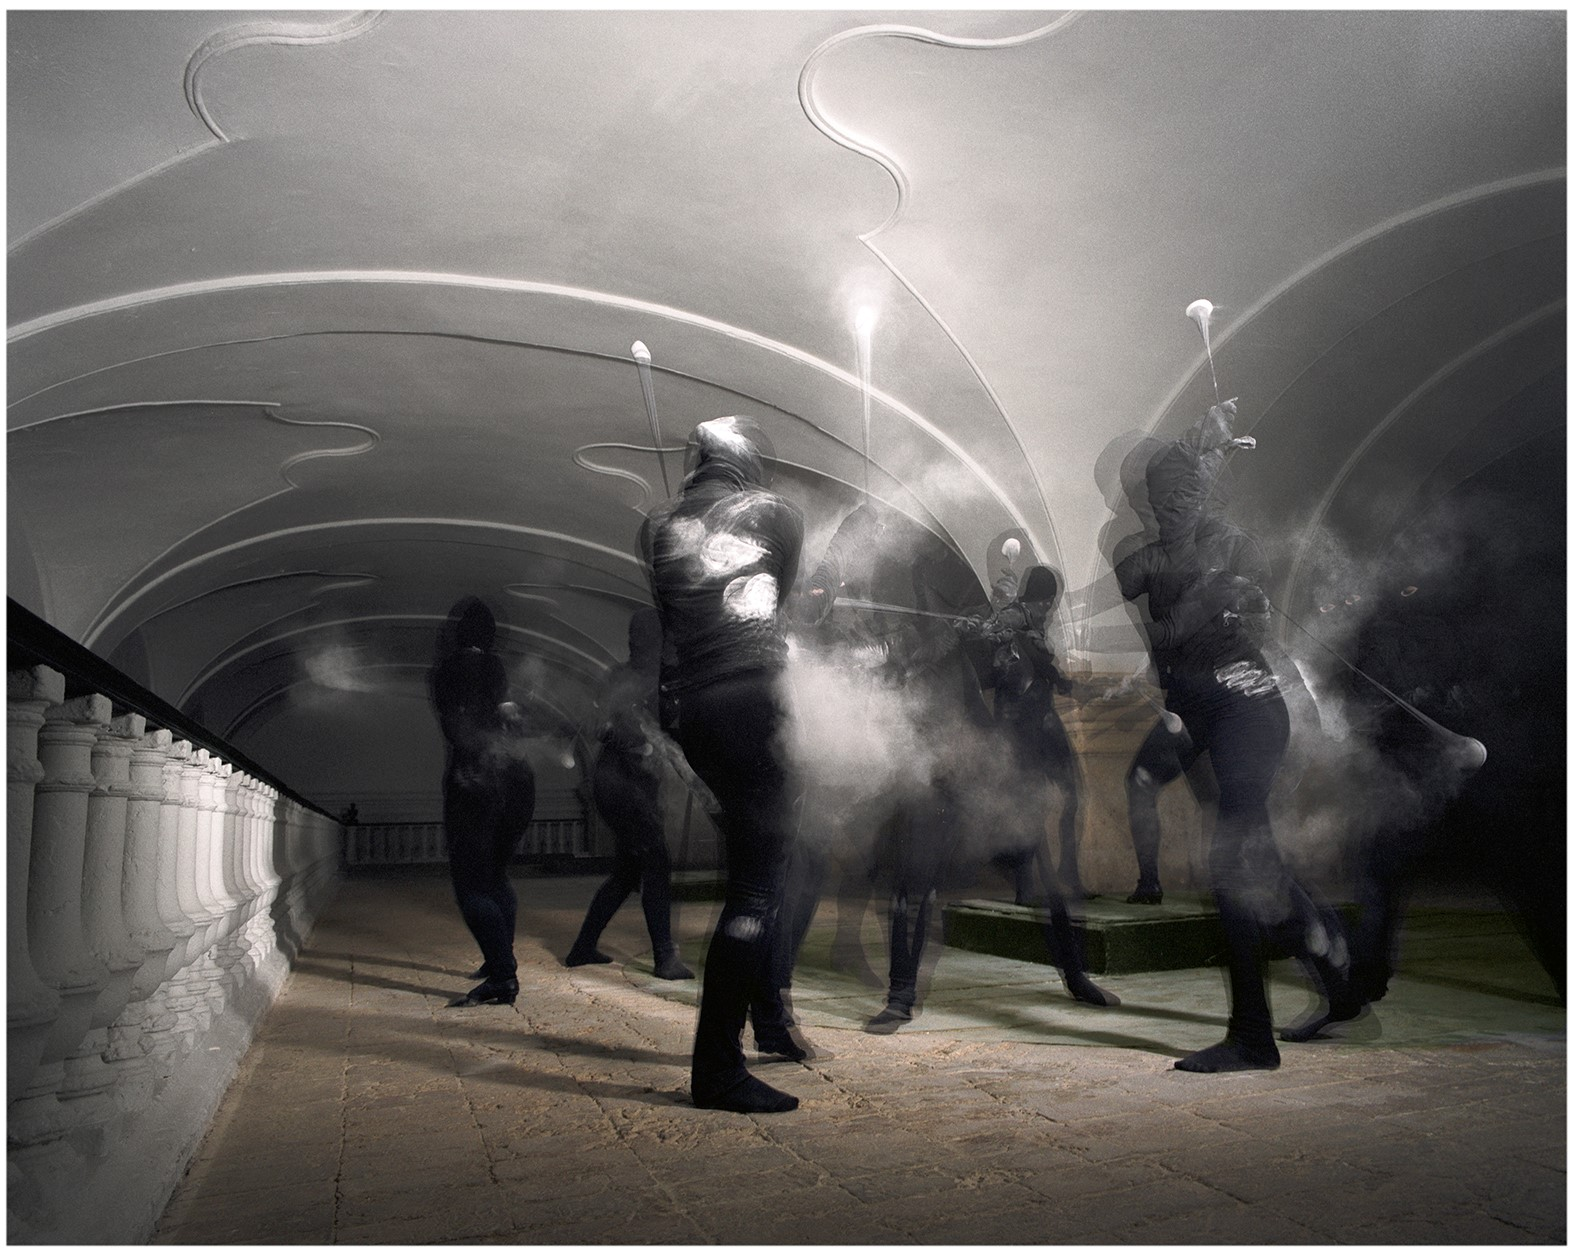 The Moonwatchers II, 2010/2021 © Linarejos Moreno